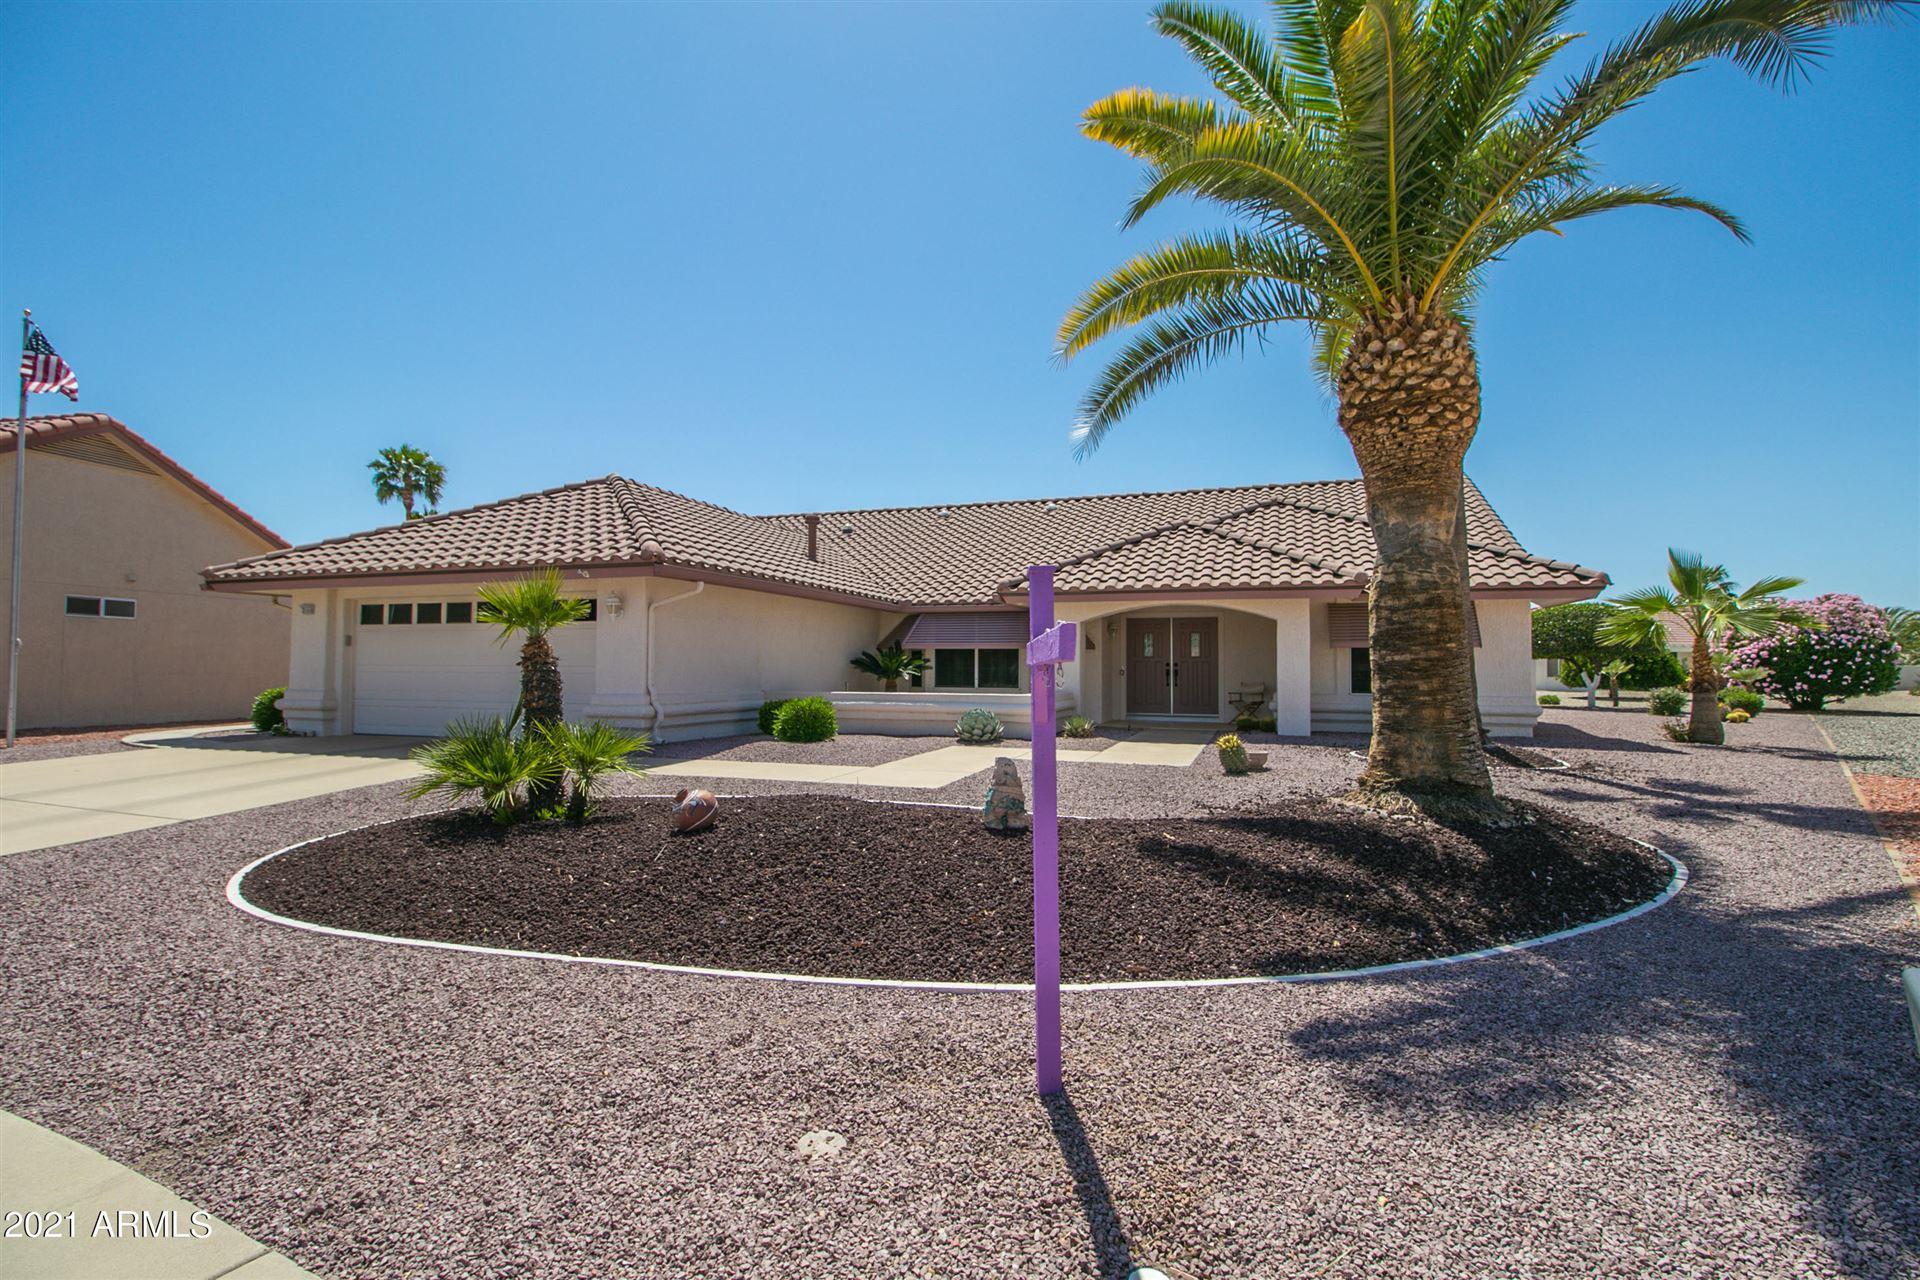 21610 N 149TH Drive, Sun City West, AZ 85375 - MLS#: 6237273